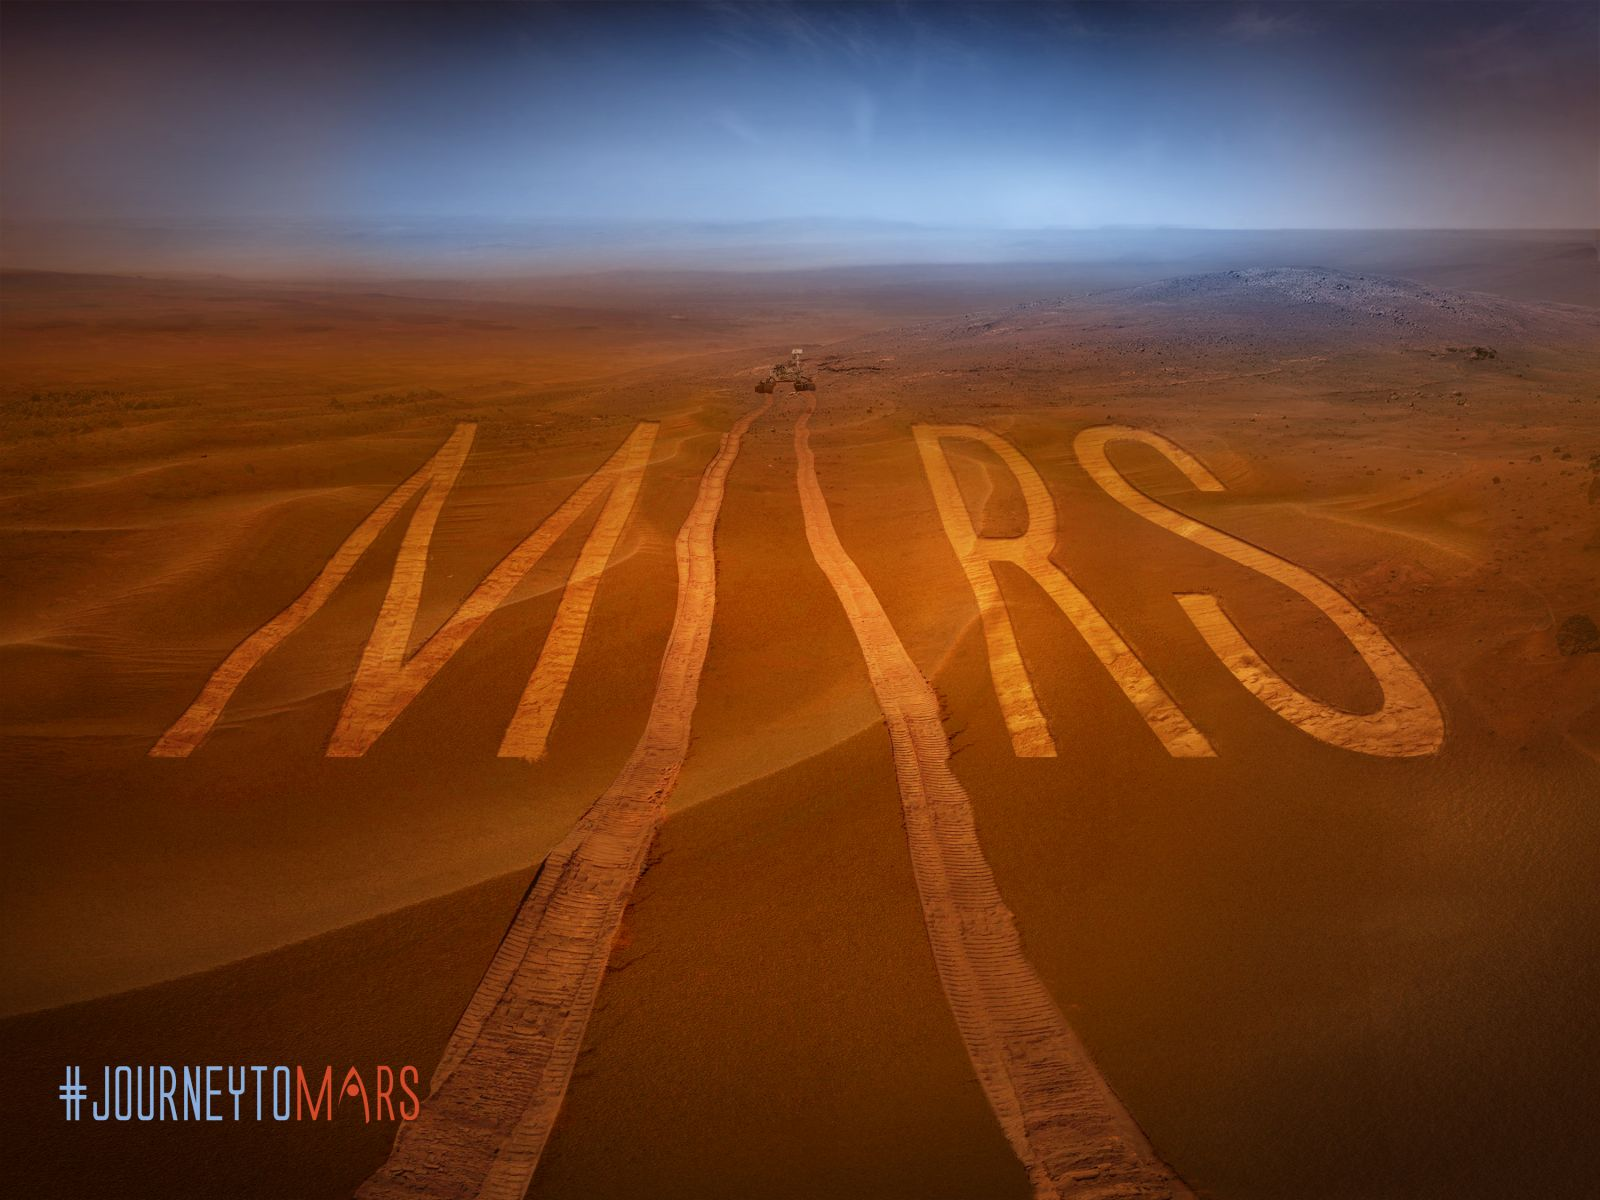 У НАСА нет денег на высадку людей на Марсе - 2